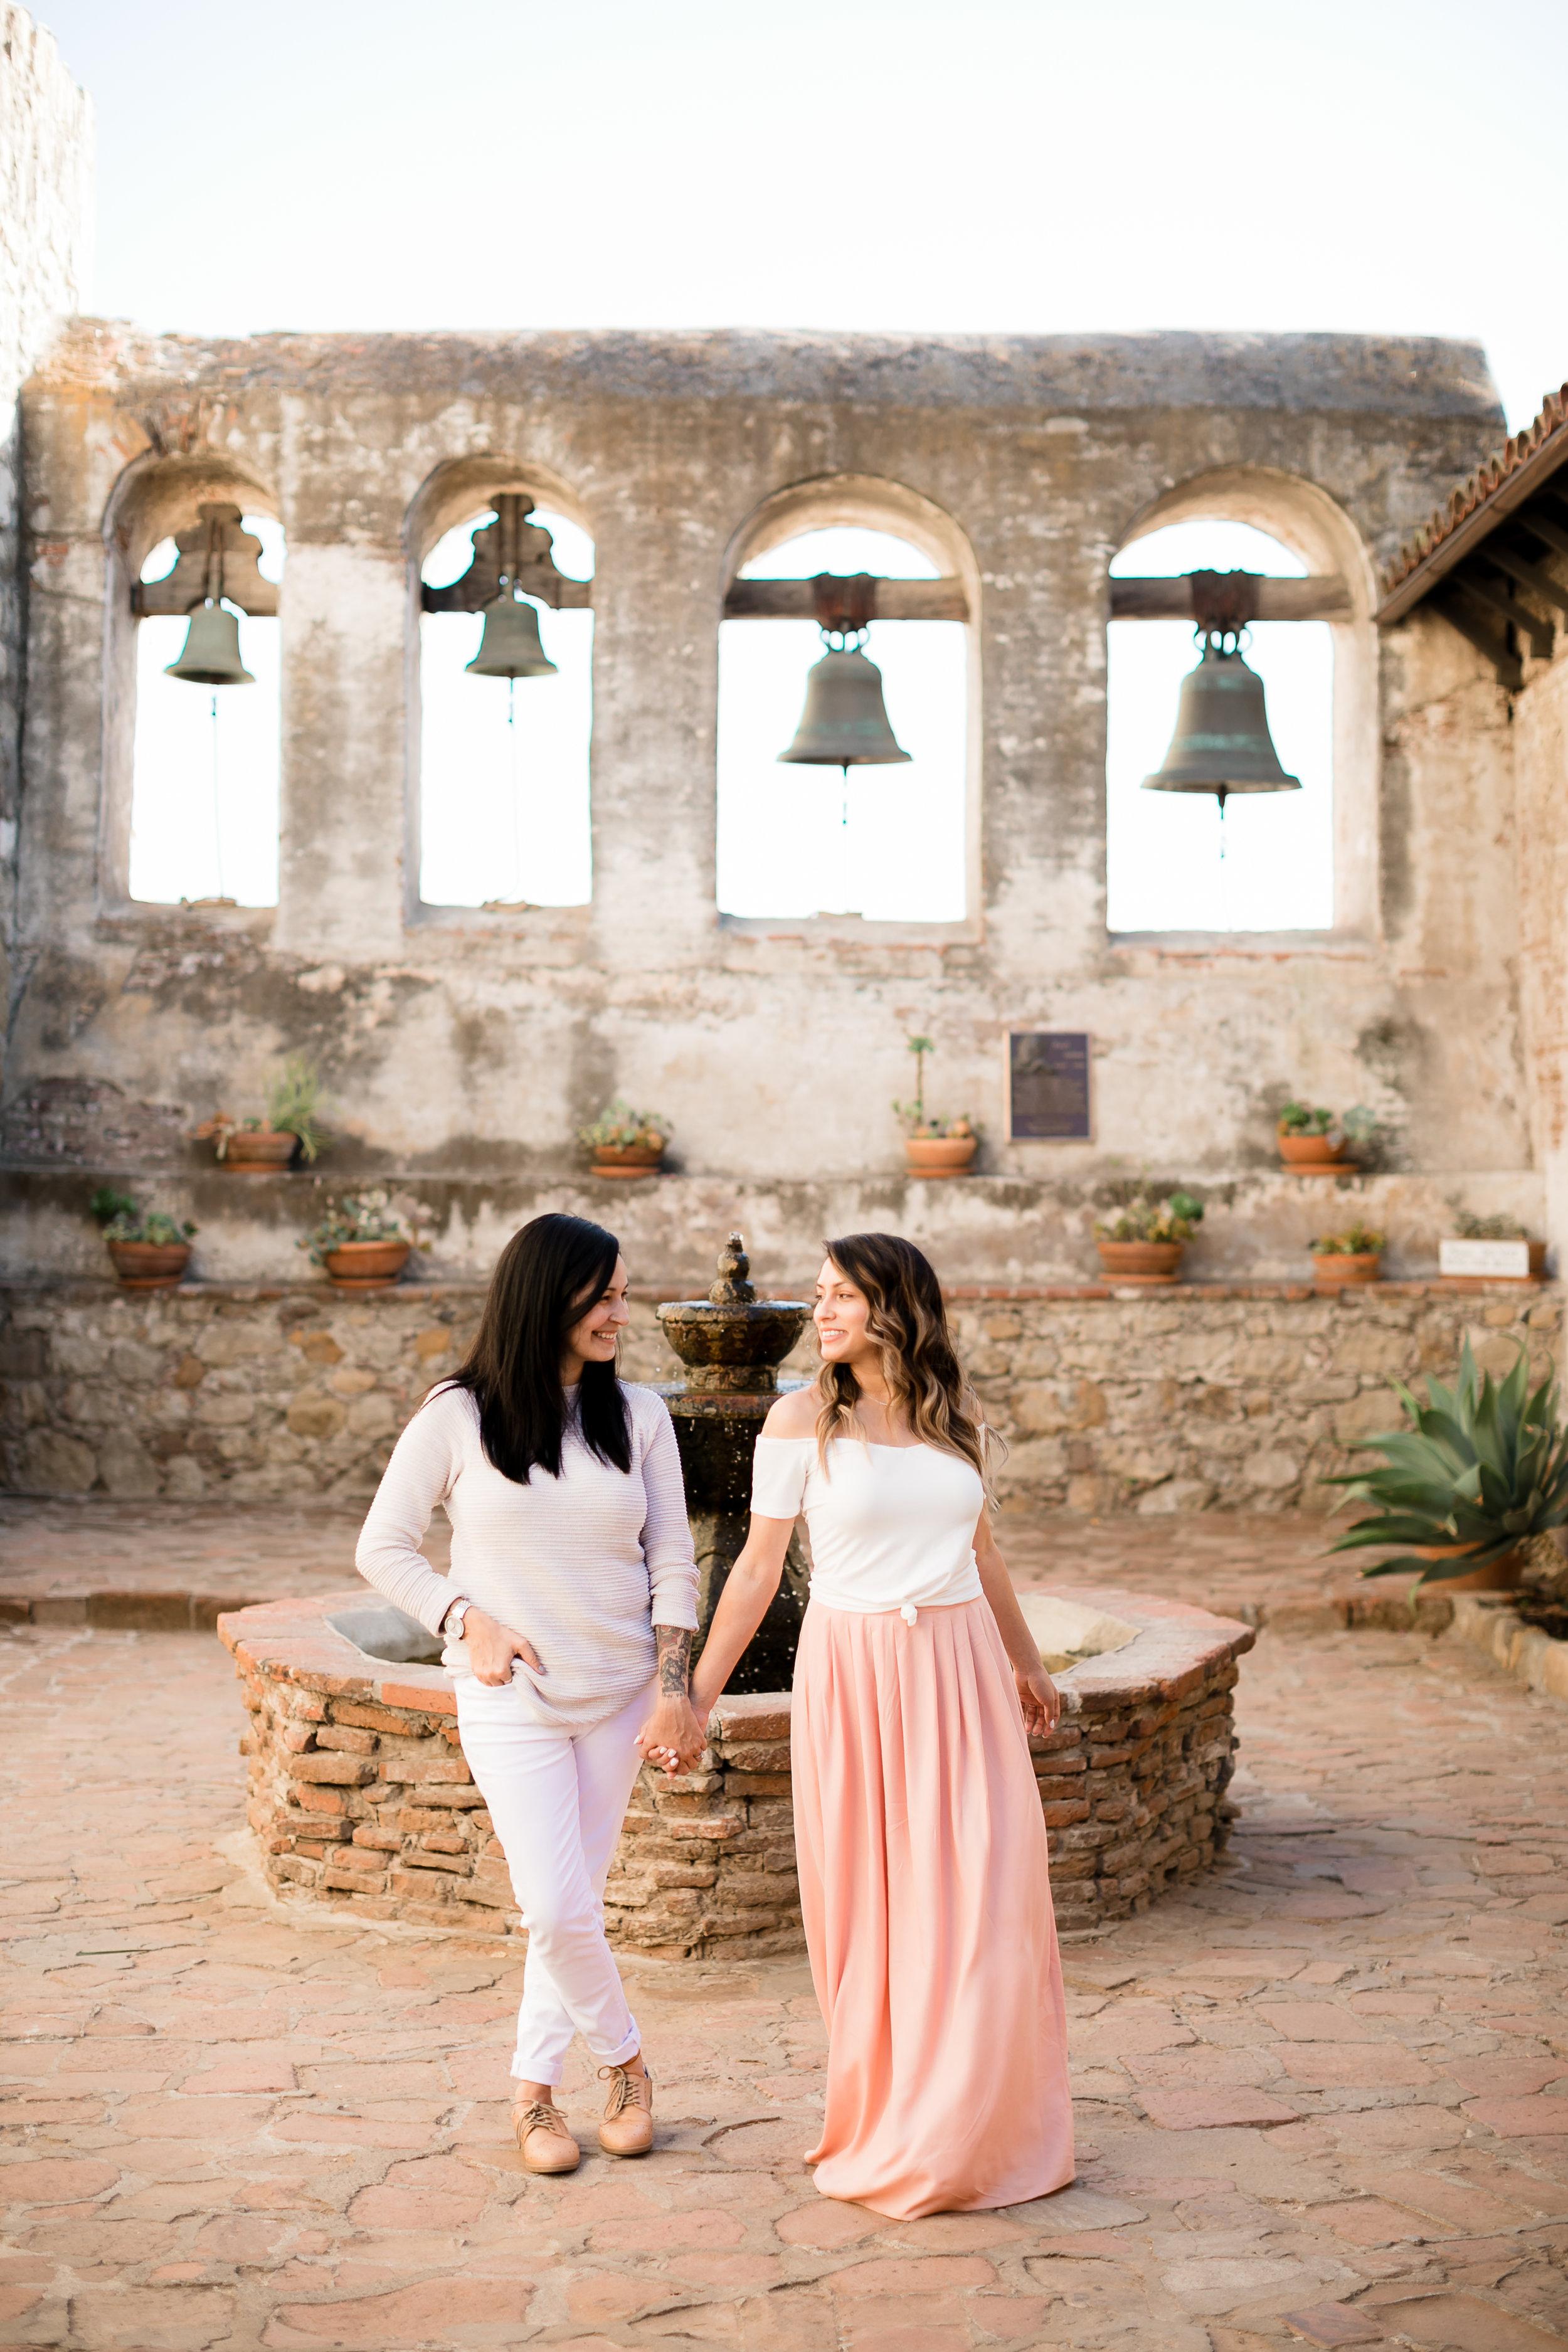 MA-Mission-San-Juan-Capistrano-Engagement 26.jpg